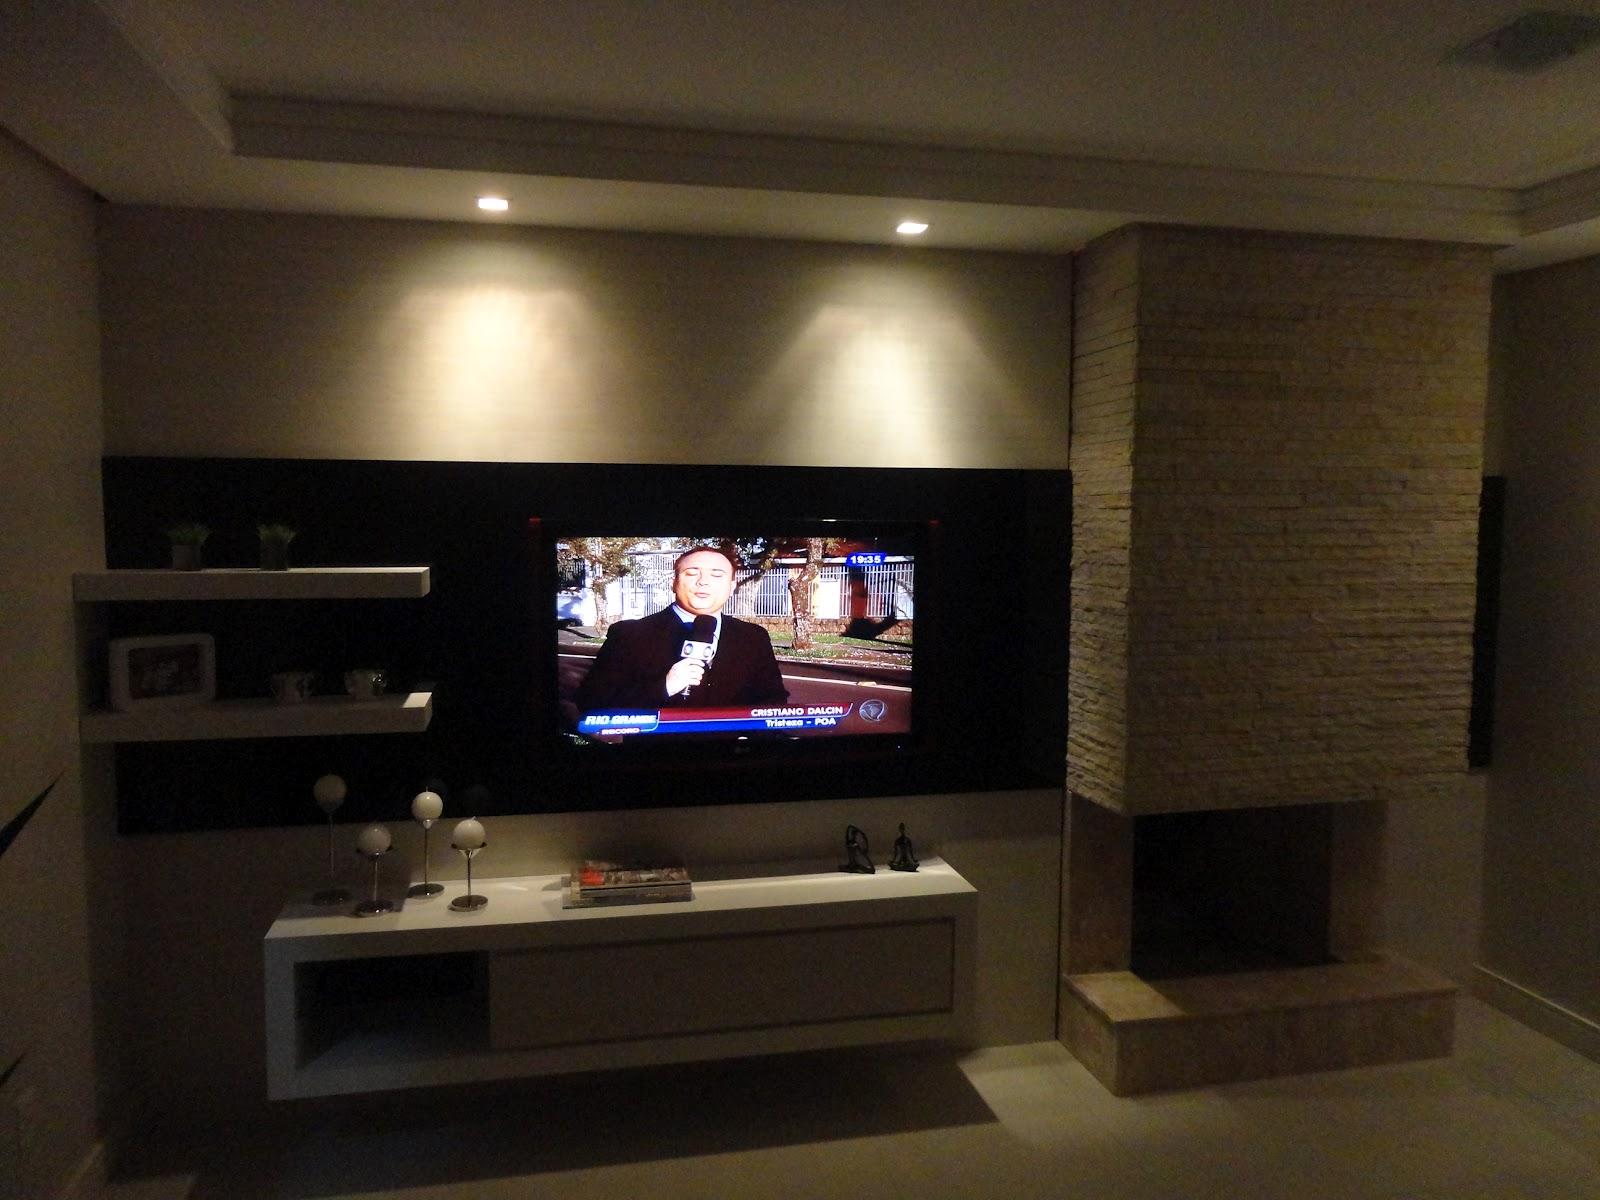 Lareira A Gas Na Sala De Tv ~ Sala De Tv Lareira a gas na sala de tv Sala de tv pequena  Salas Tv